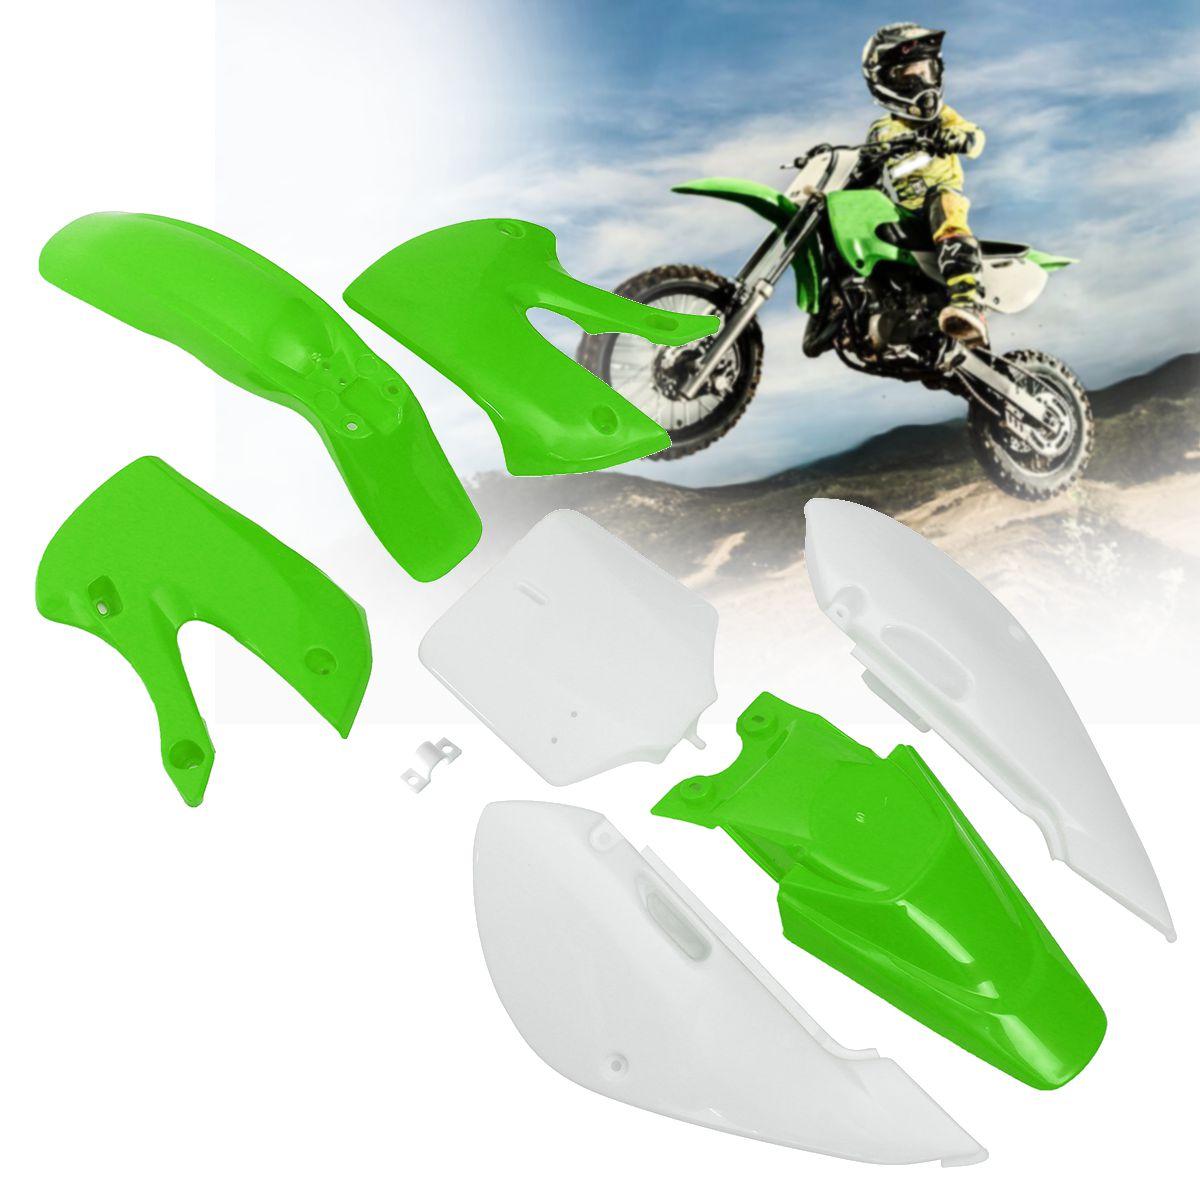 TDPRO Plastics Bolt Body Screw Set for KLX110 DRZ110 BBR Fairing Panel Fenders Seat